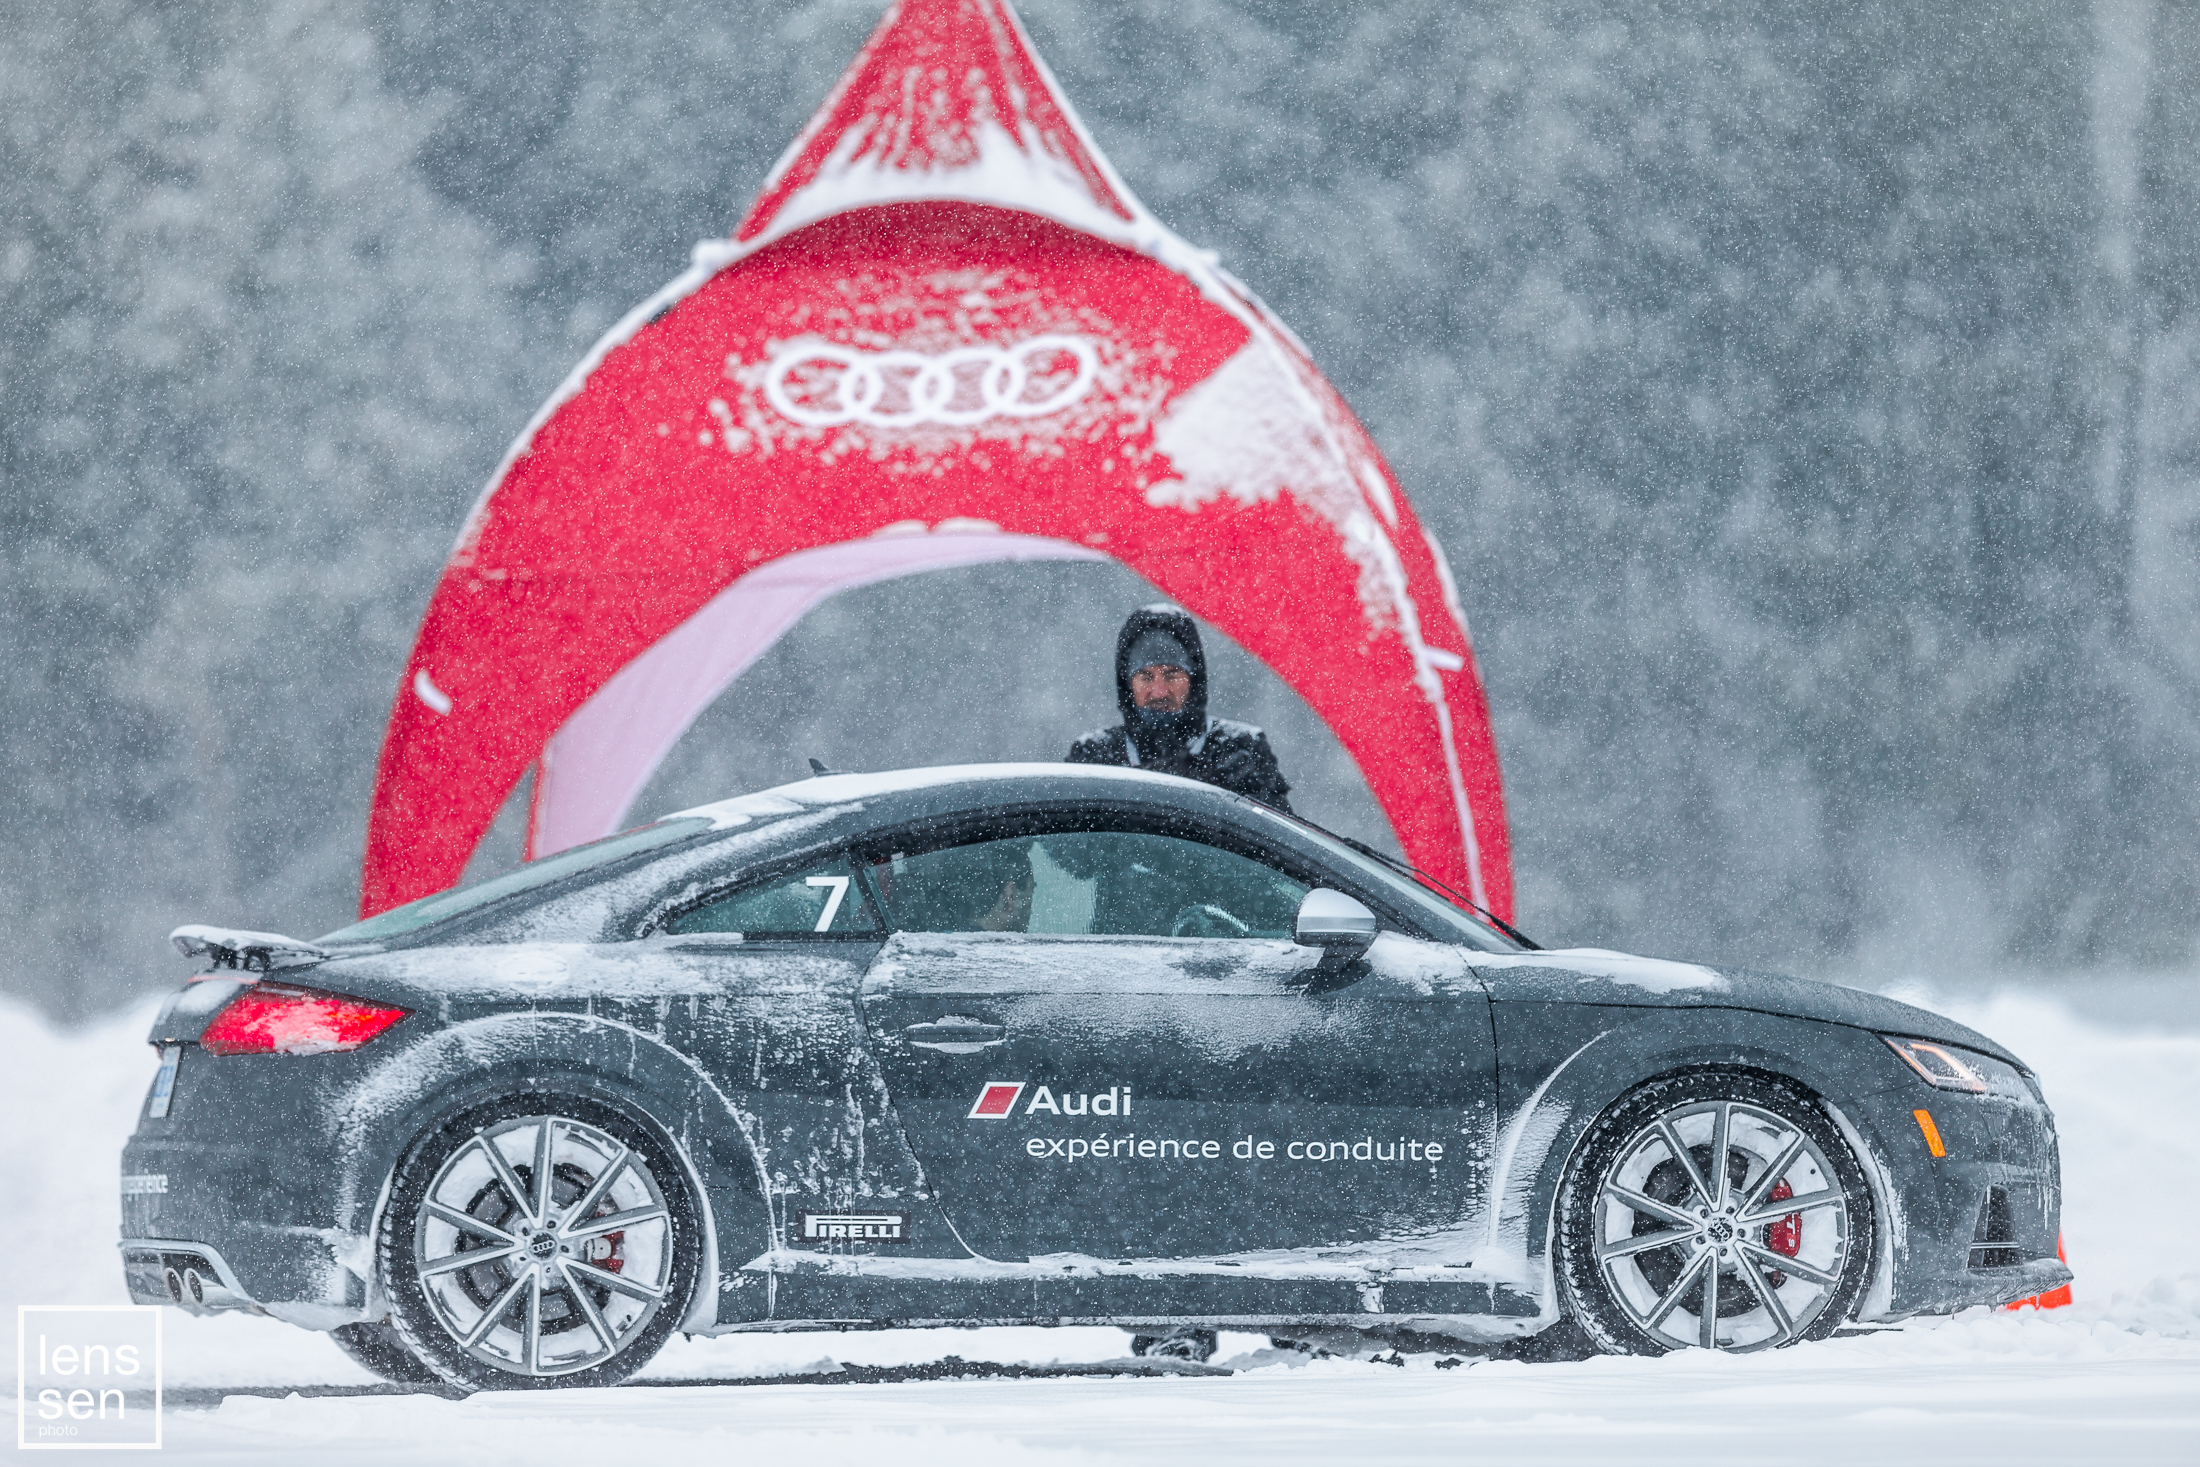 Audi Ice Experience - Sacacomie QC - Feb 2018 - 123 -3614.jpg